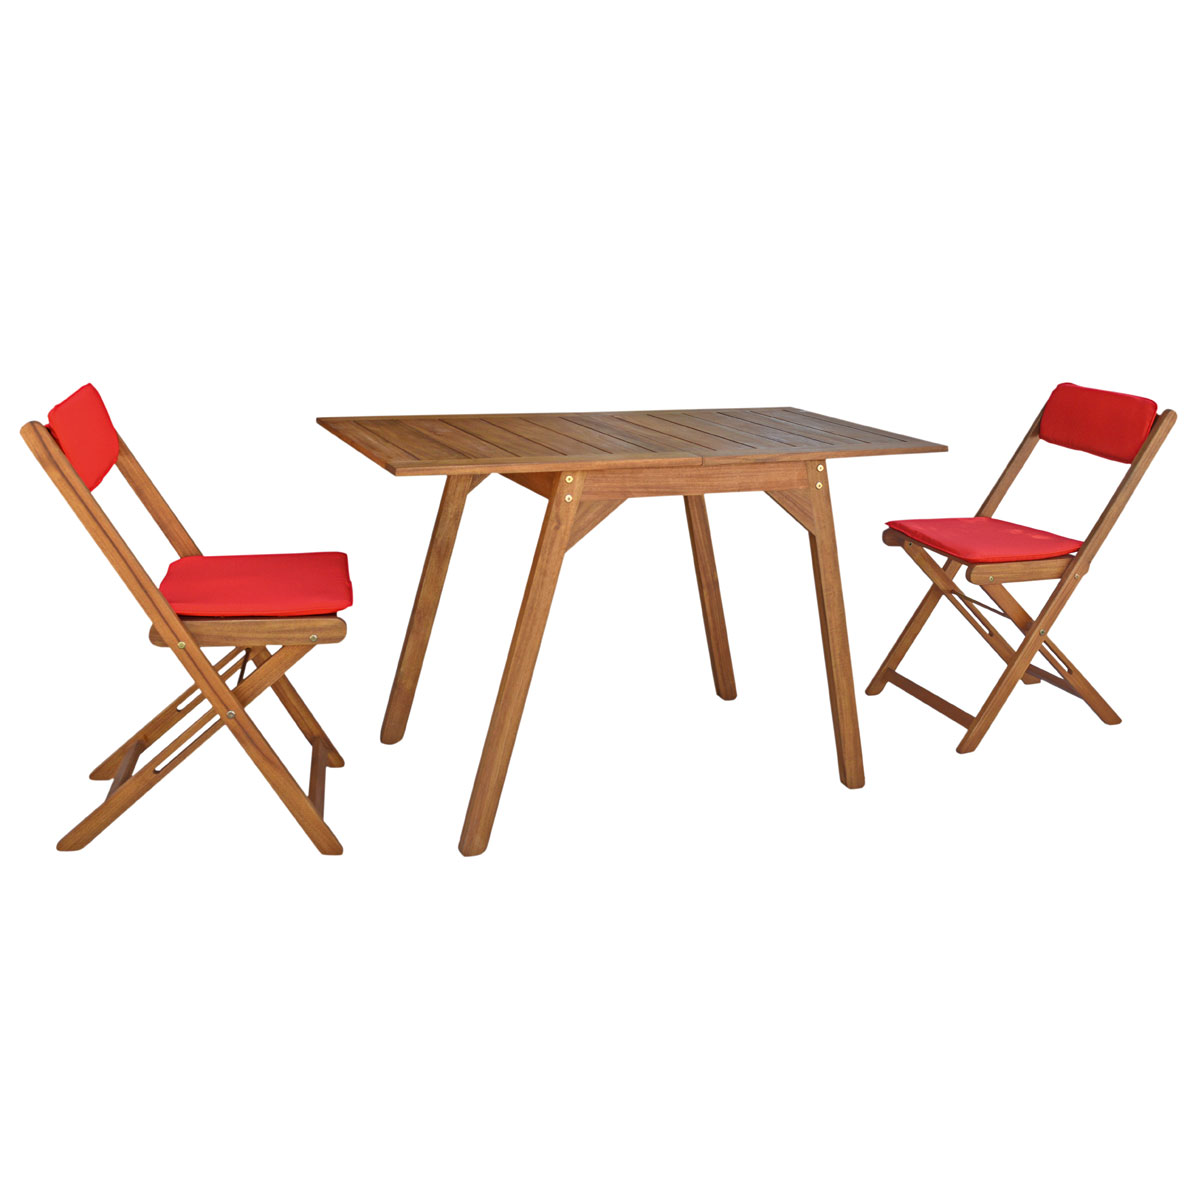 "Gartenmöbel Sets - Balkonmöbel Set ""Rhodos"", Ausziehtisch 2 Klappsessel, Eukalyptusholz  - Onlineshop Hellweg"